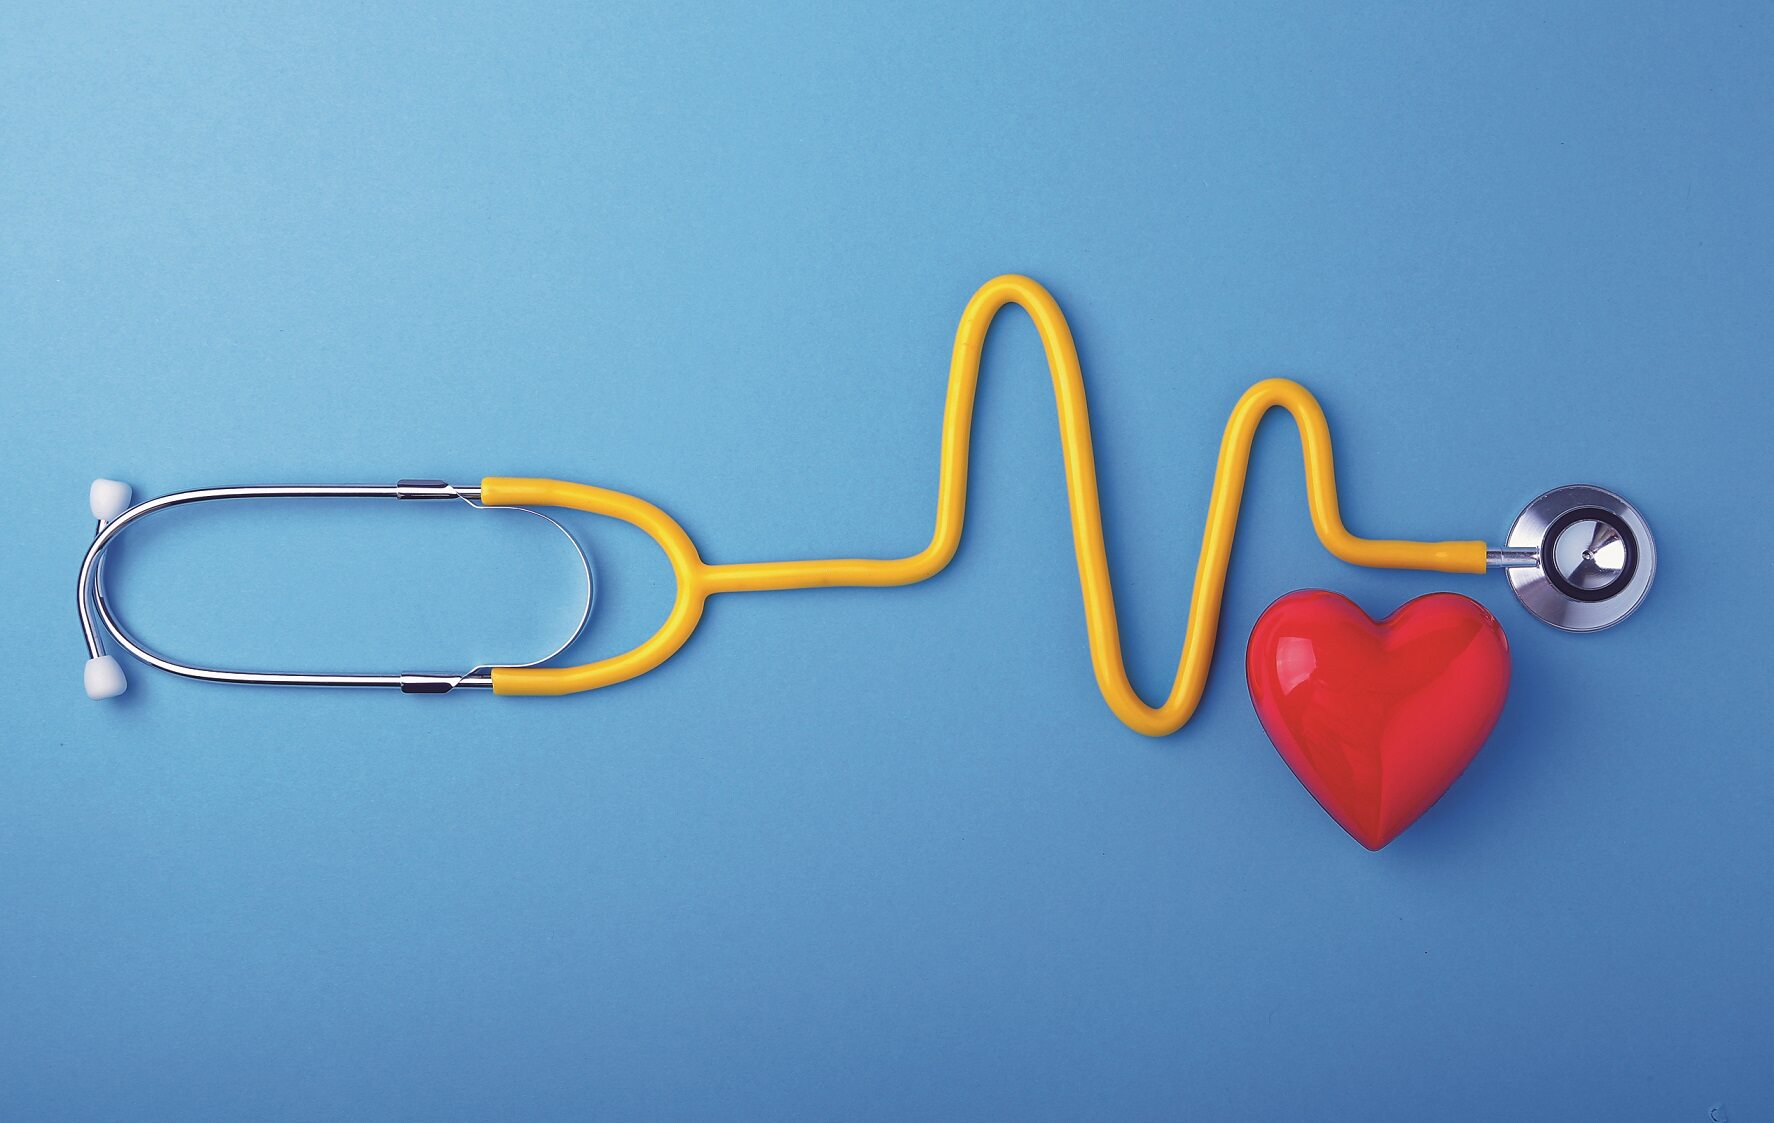 Kardiologia: Nowe technologie